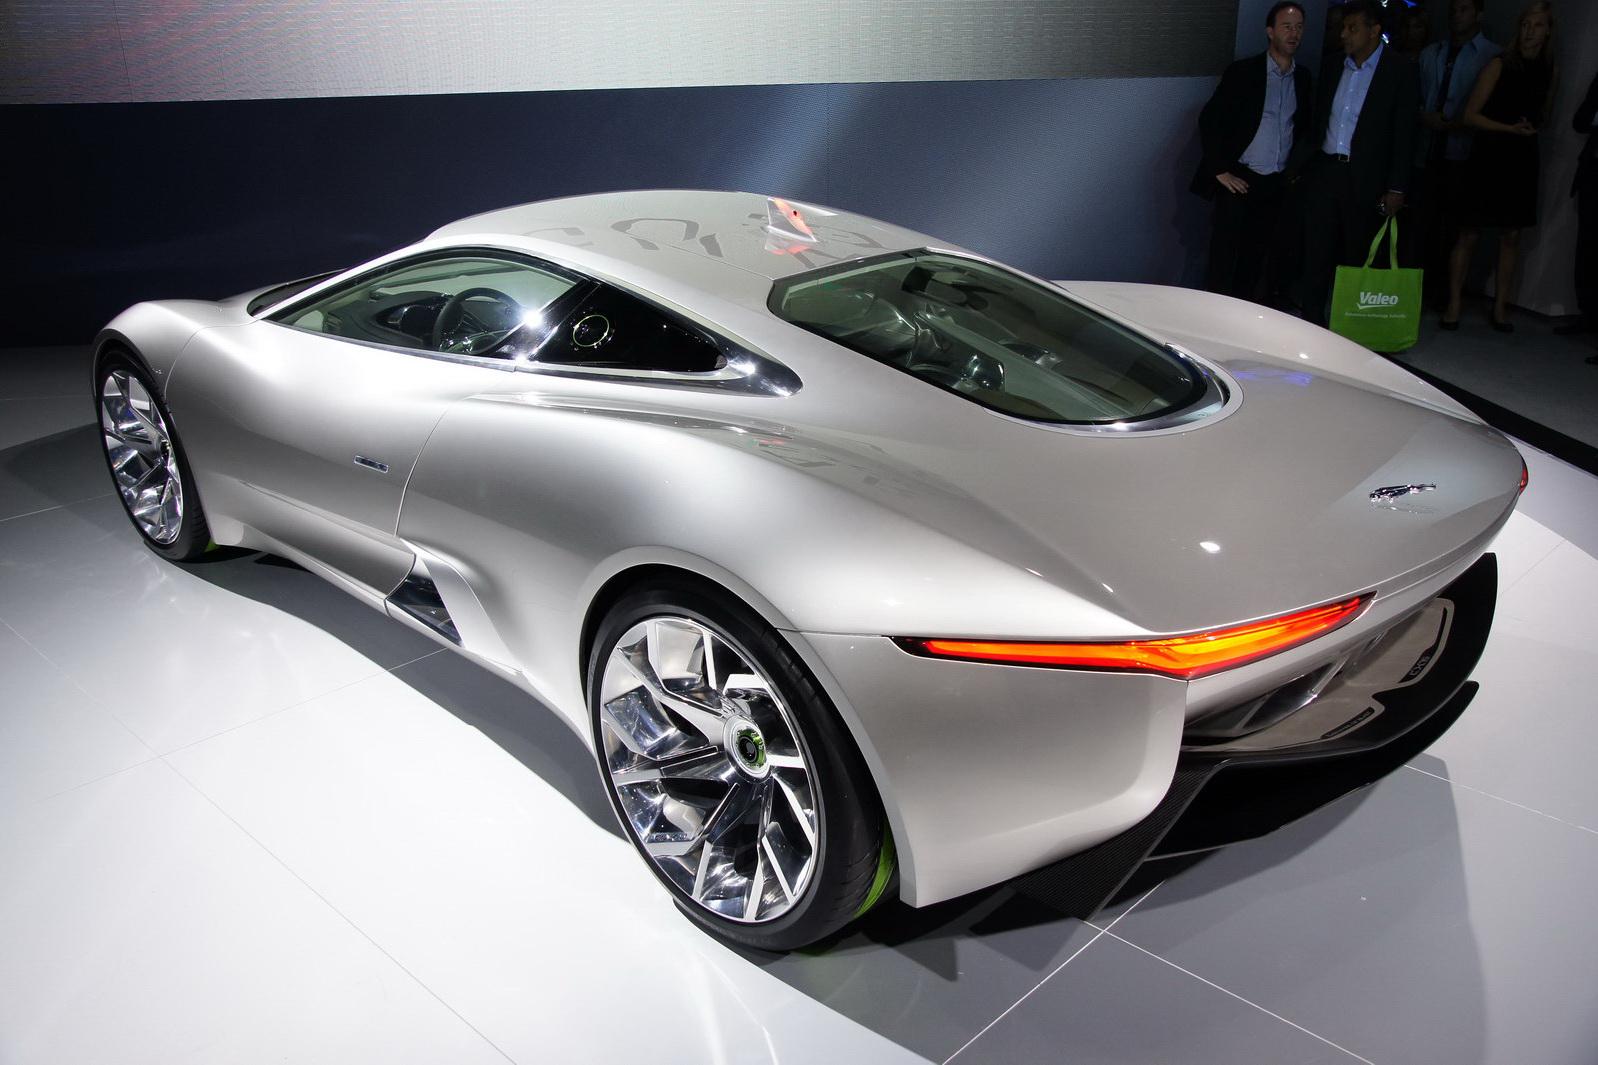 2011 jaguar c x75 automotive cars. Black Bedroom Furniture Sets. Home Design Ideas